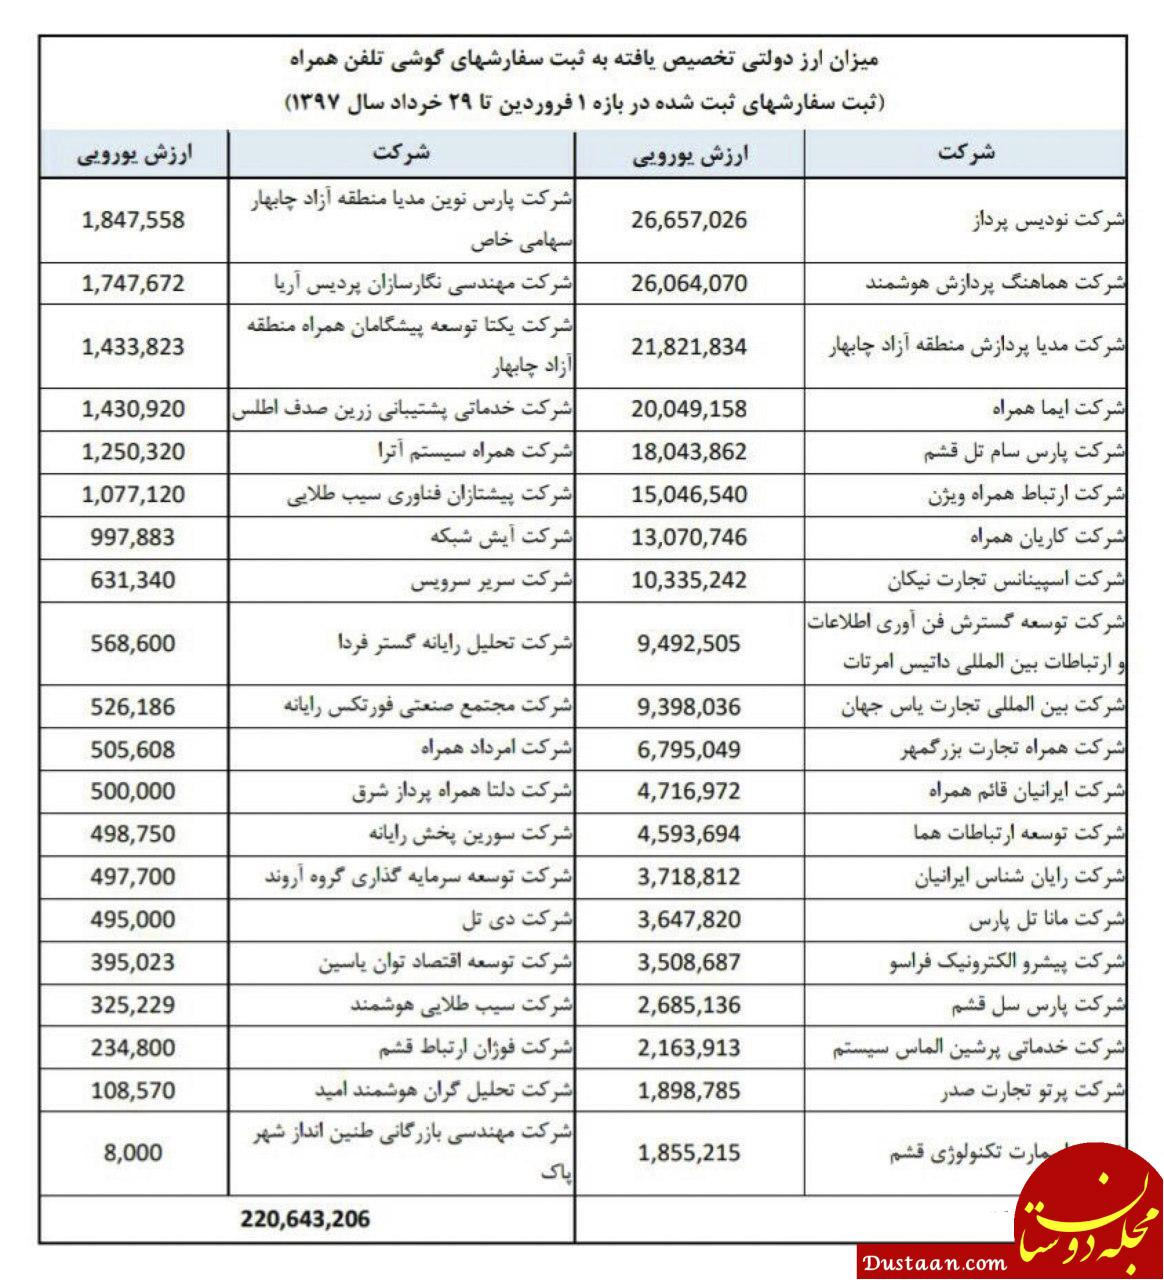 www.dustaan.com وزارت ارتباطات فهرست واردکنندگان گوشی همراه با ارز دولتی را منتشر کرد